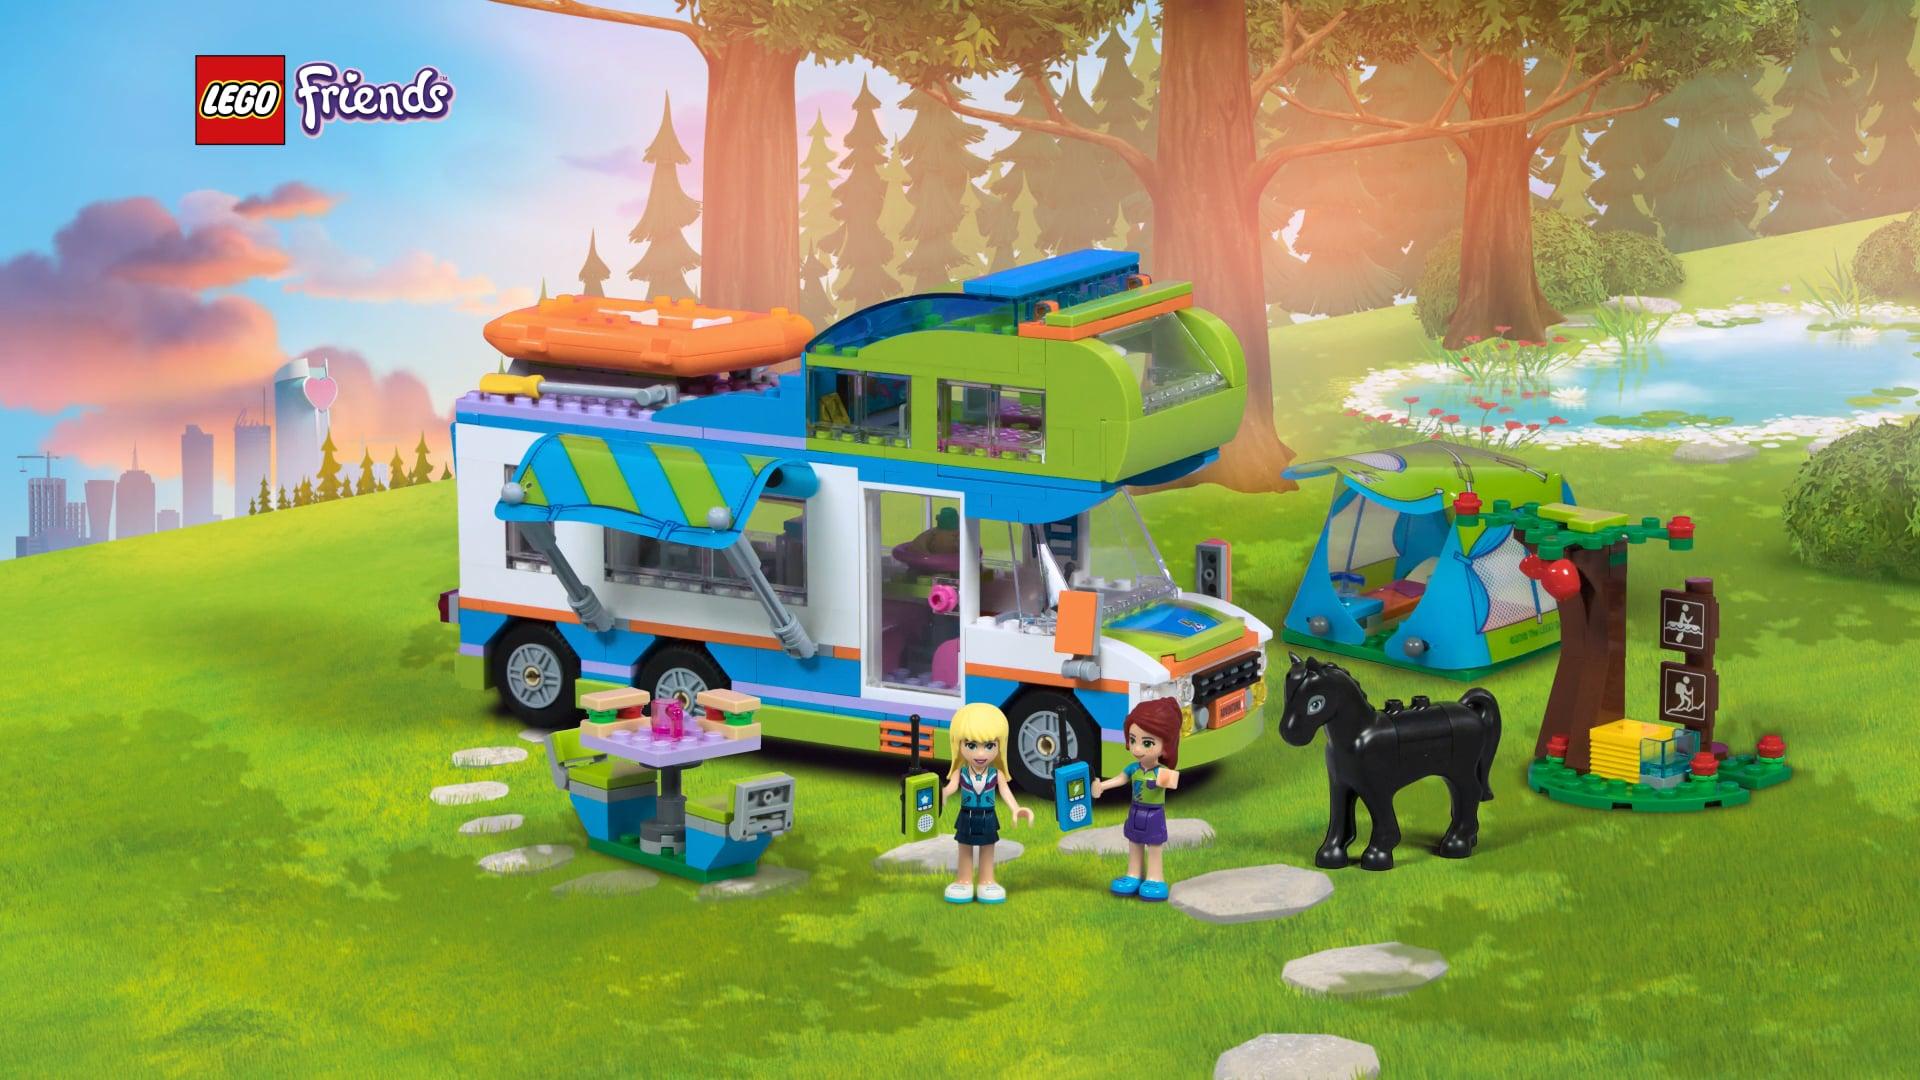 Lego Friends - Camper van